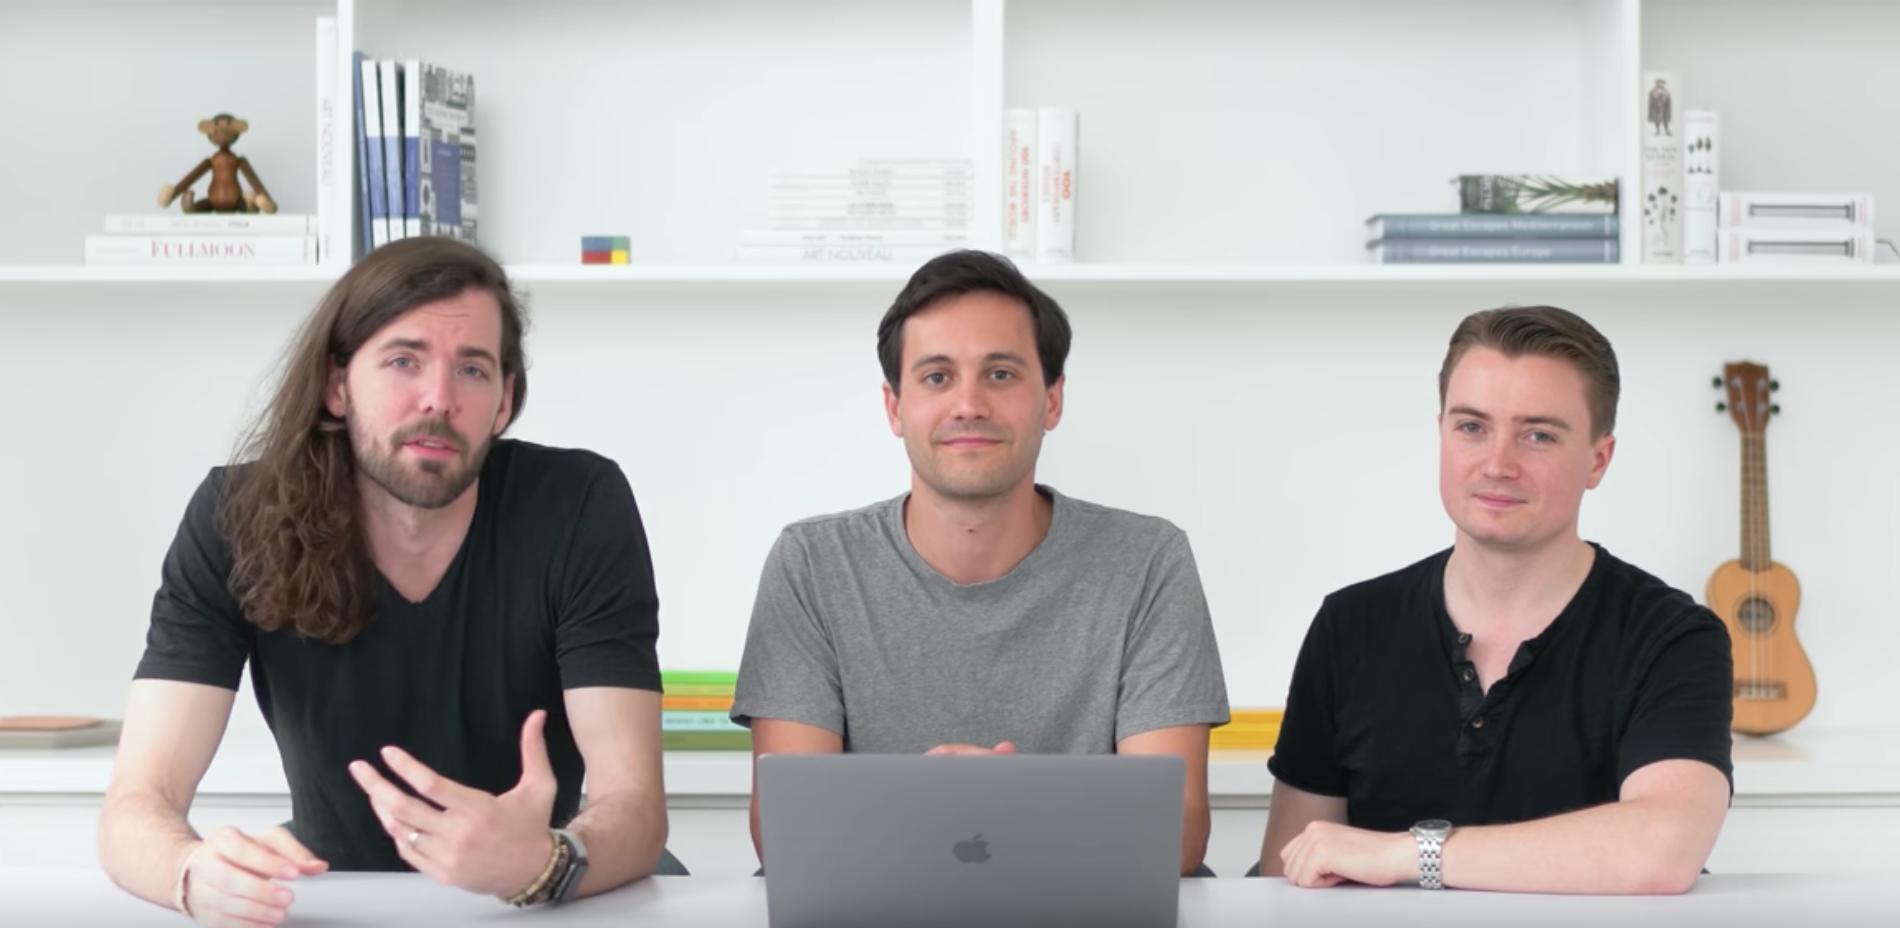 Trojice zakladatelů, zleva Adam Menges, Mike Matas a Markus Beissinger